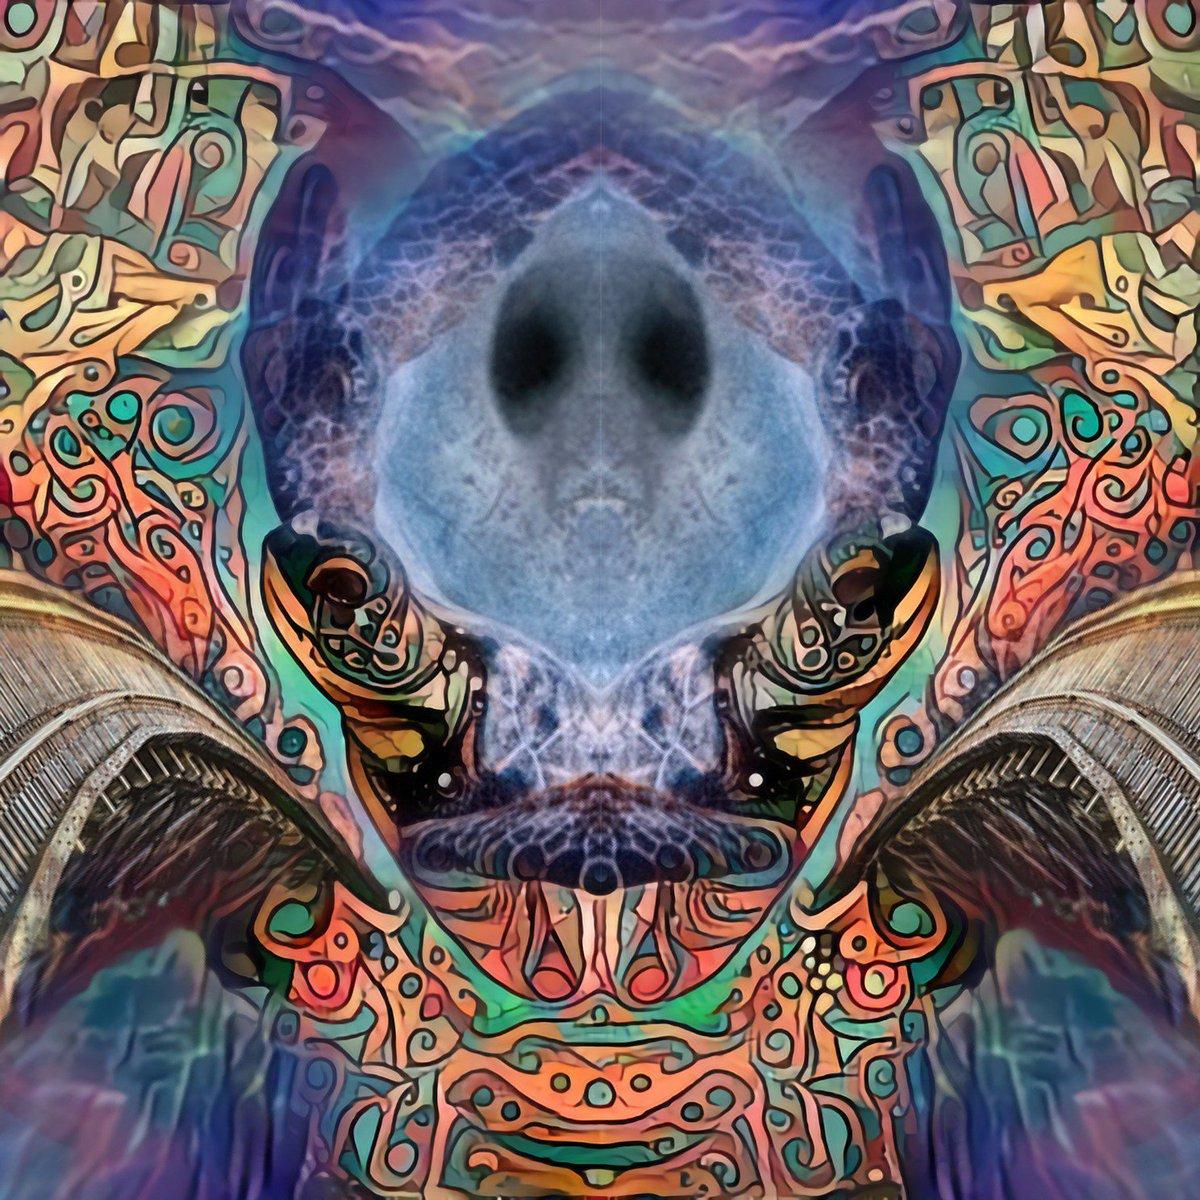 Fast+cheap+convenient=Fiverr  https:// goo.gl/6WNbTU  &nbsp;                   Then:  https:// goo.gl/J8VvBm  &nbsp;        #edm #techno #techhouse #psytrance #hiphop #deephouse #Club #trap #pop #electro #music #trippy #albumcover  #digitalart #graphicdesign #art #artwork #psychedelic #Fiverr<br>http://pic.twitter.com/FOylysB3db